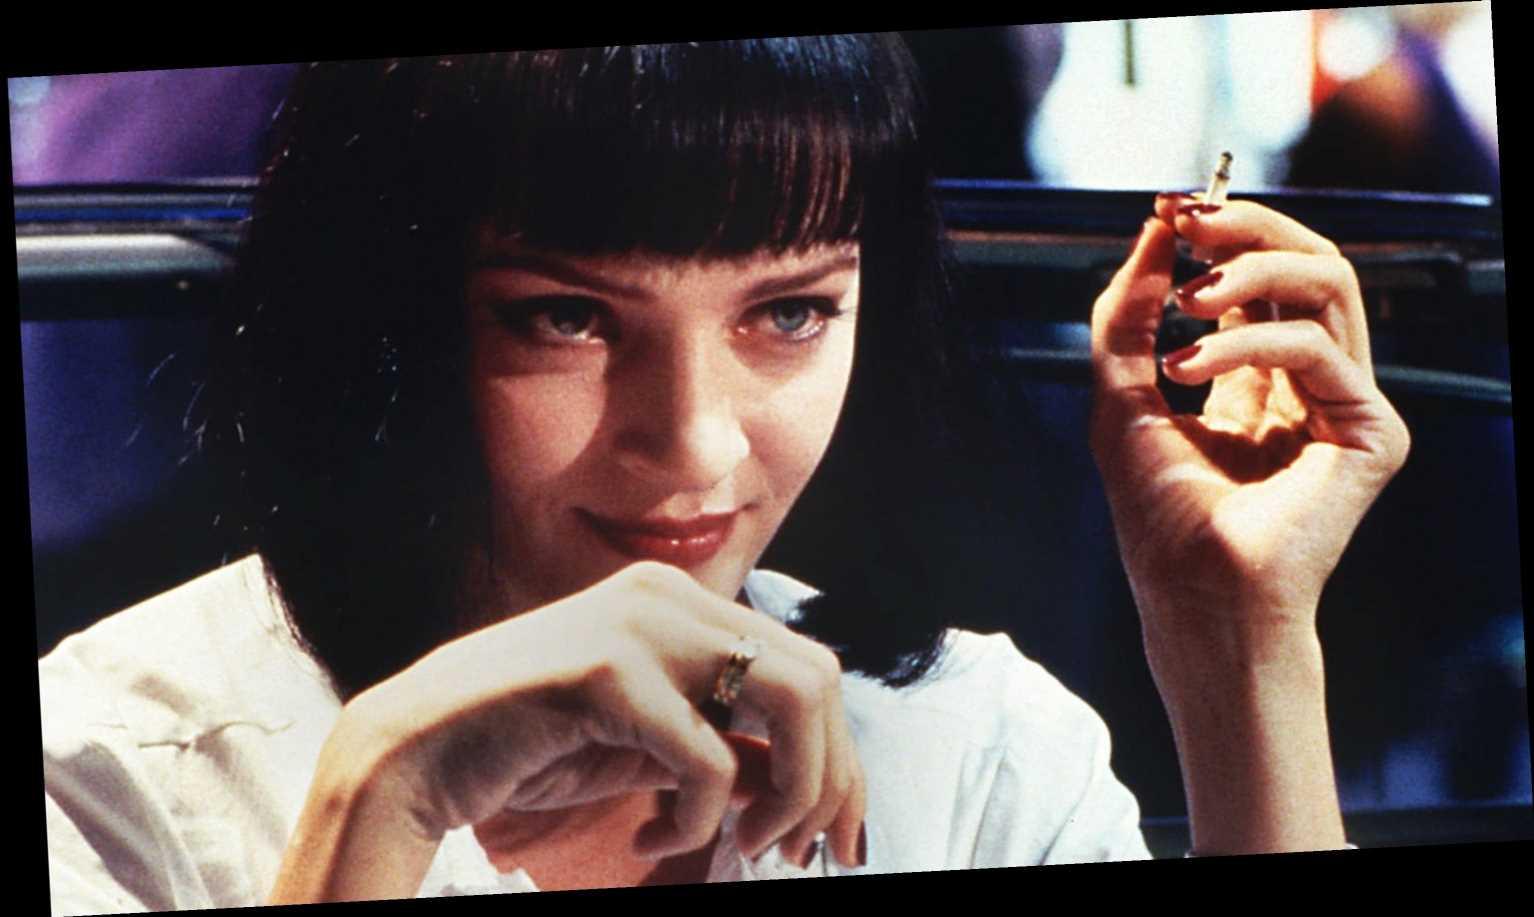 'Pulp Fiction' turns 25: Quentin Tarantino made hearts stop with Uma Thurman's overdose scene